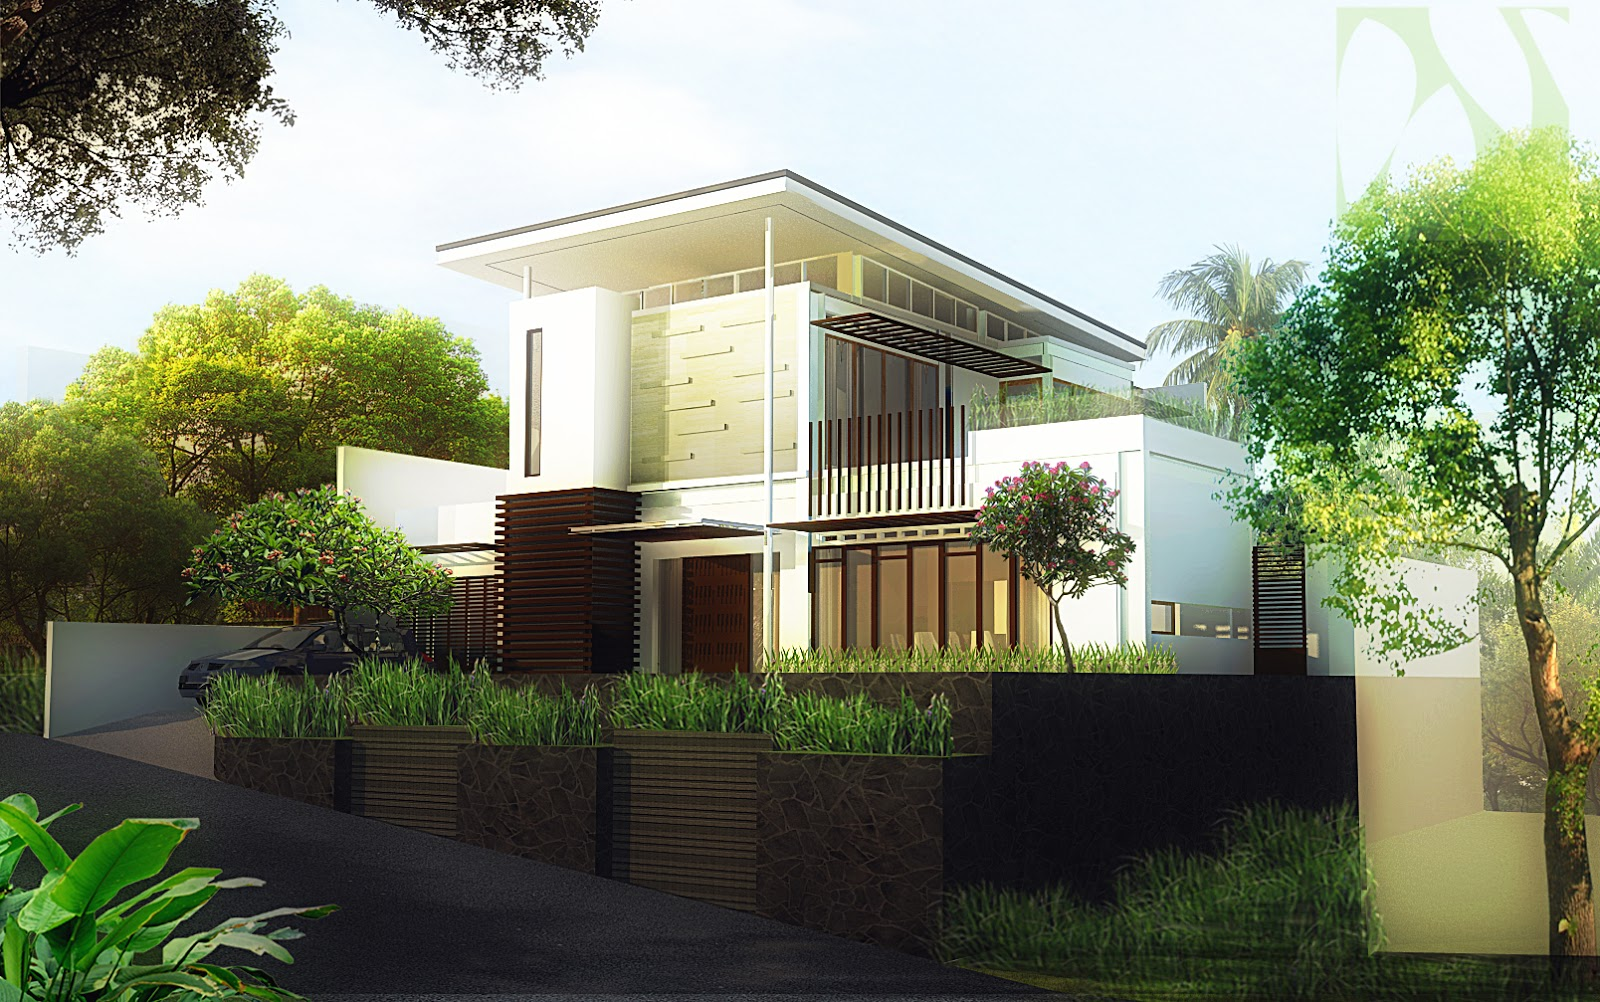 58 Koleksi Foto Desain Arsitektur Bandung HD Download Gratis